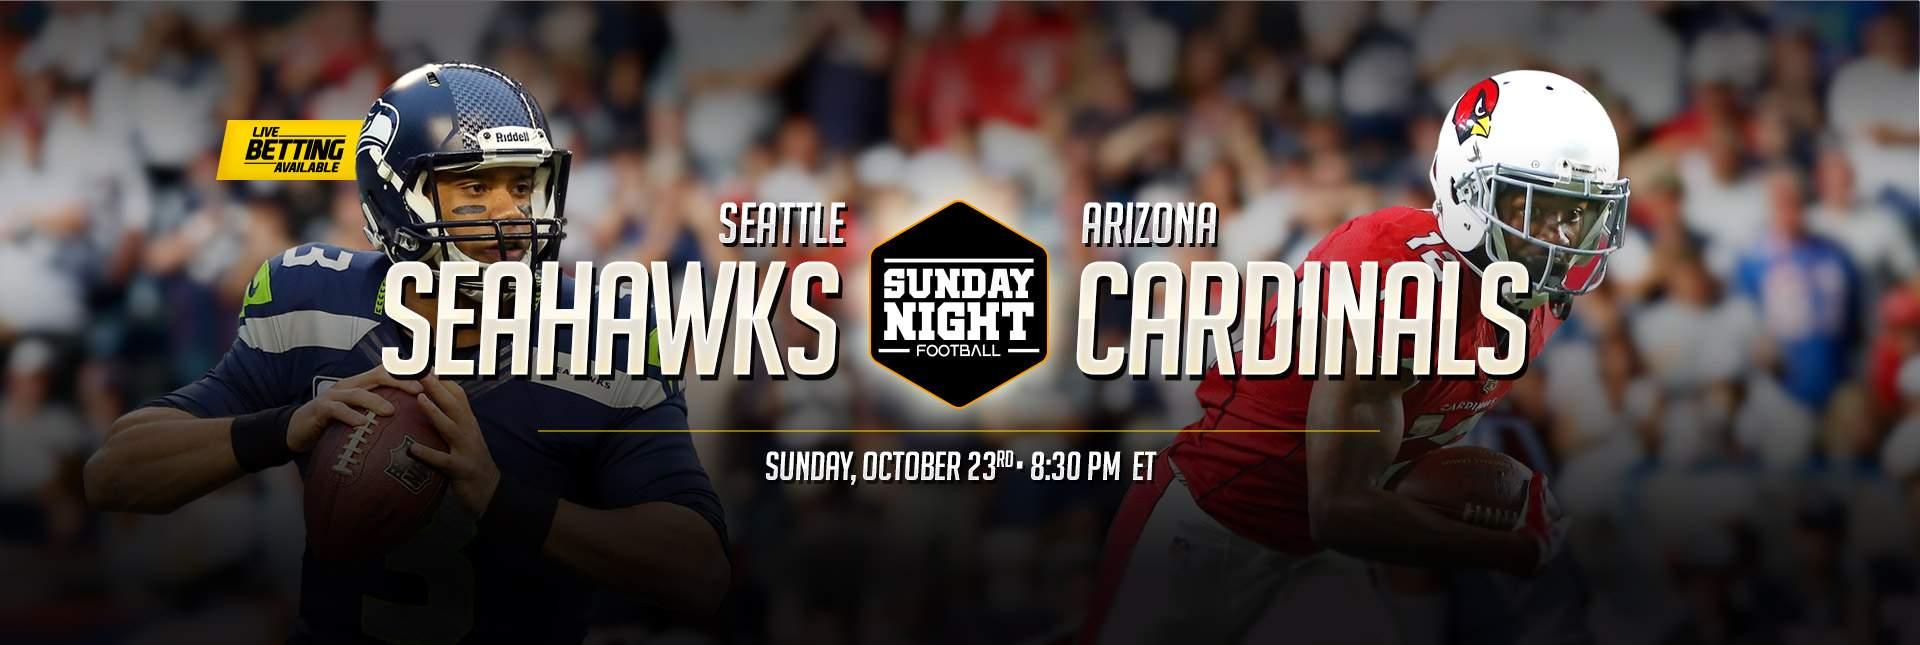 SNF Seahawks vs Cardinals